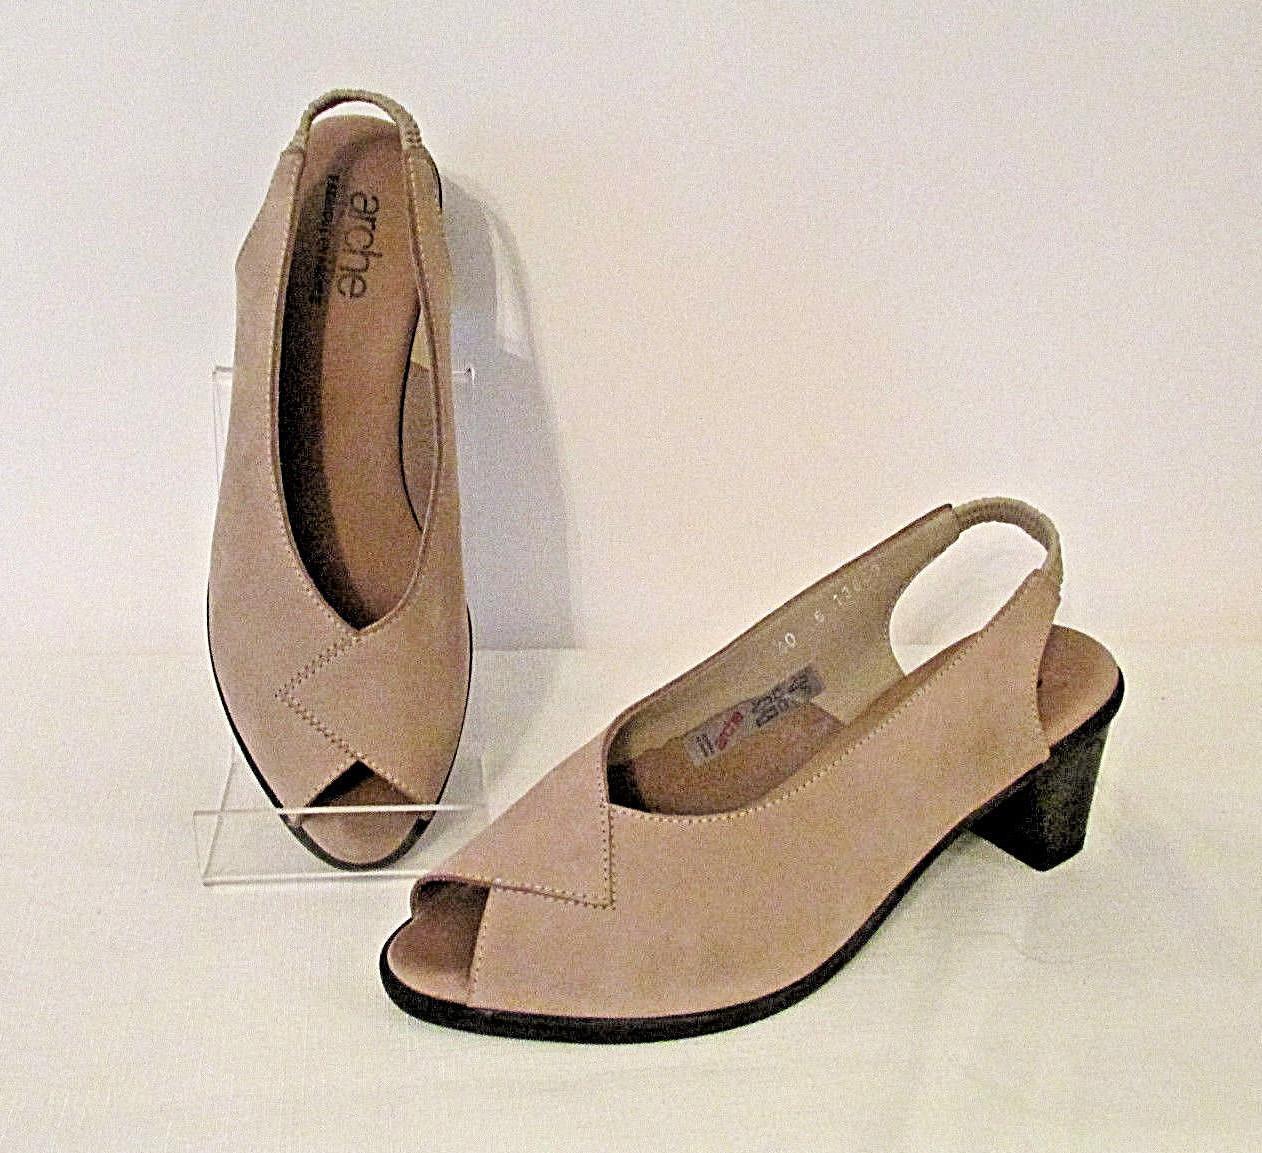 ARCHE France Taupe Suede Leder Peep Toe Slingback Sandales Schuhes 40 9 Heels EUC